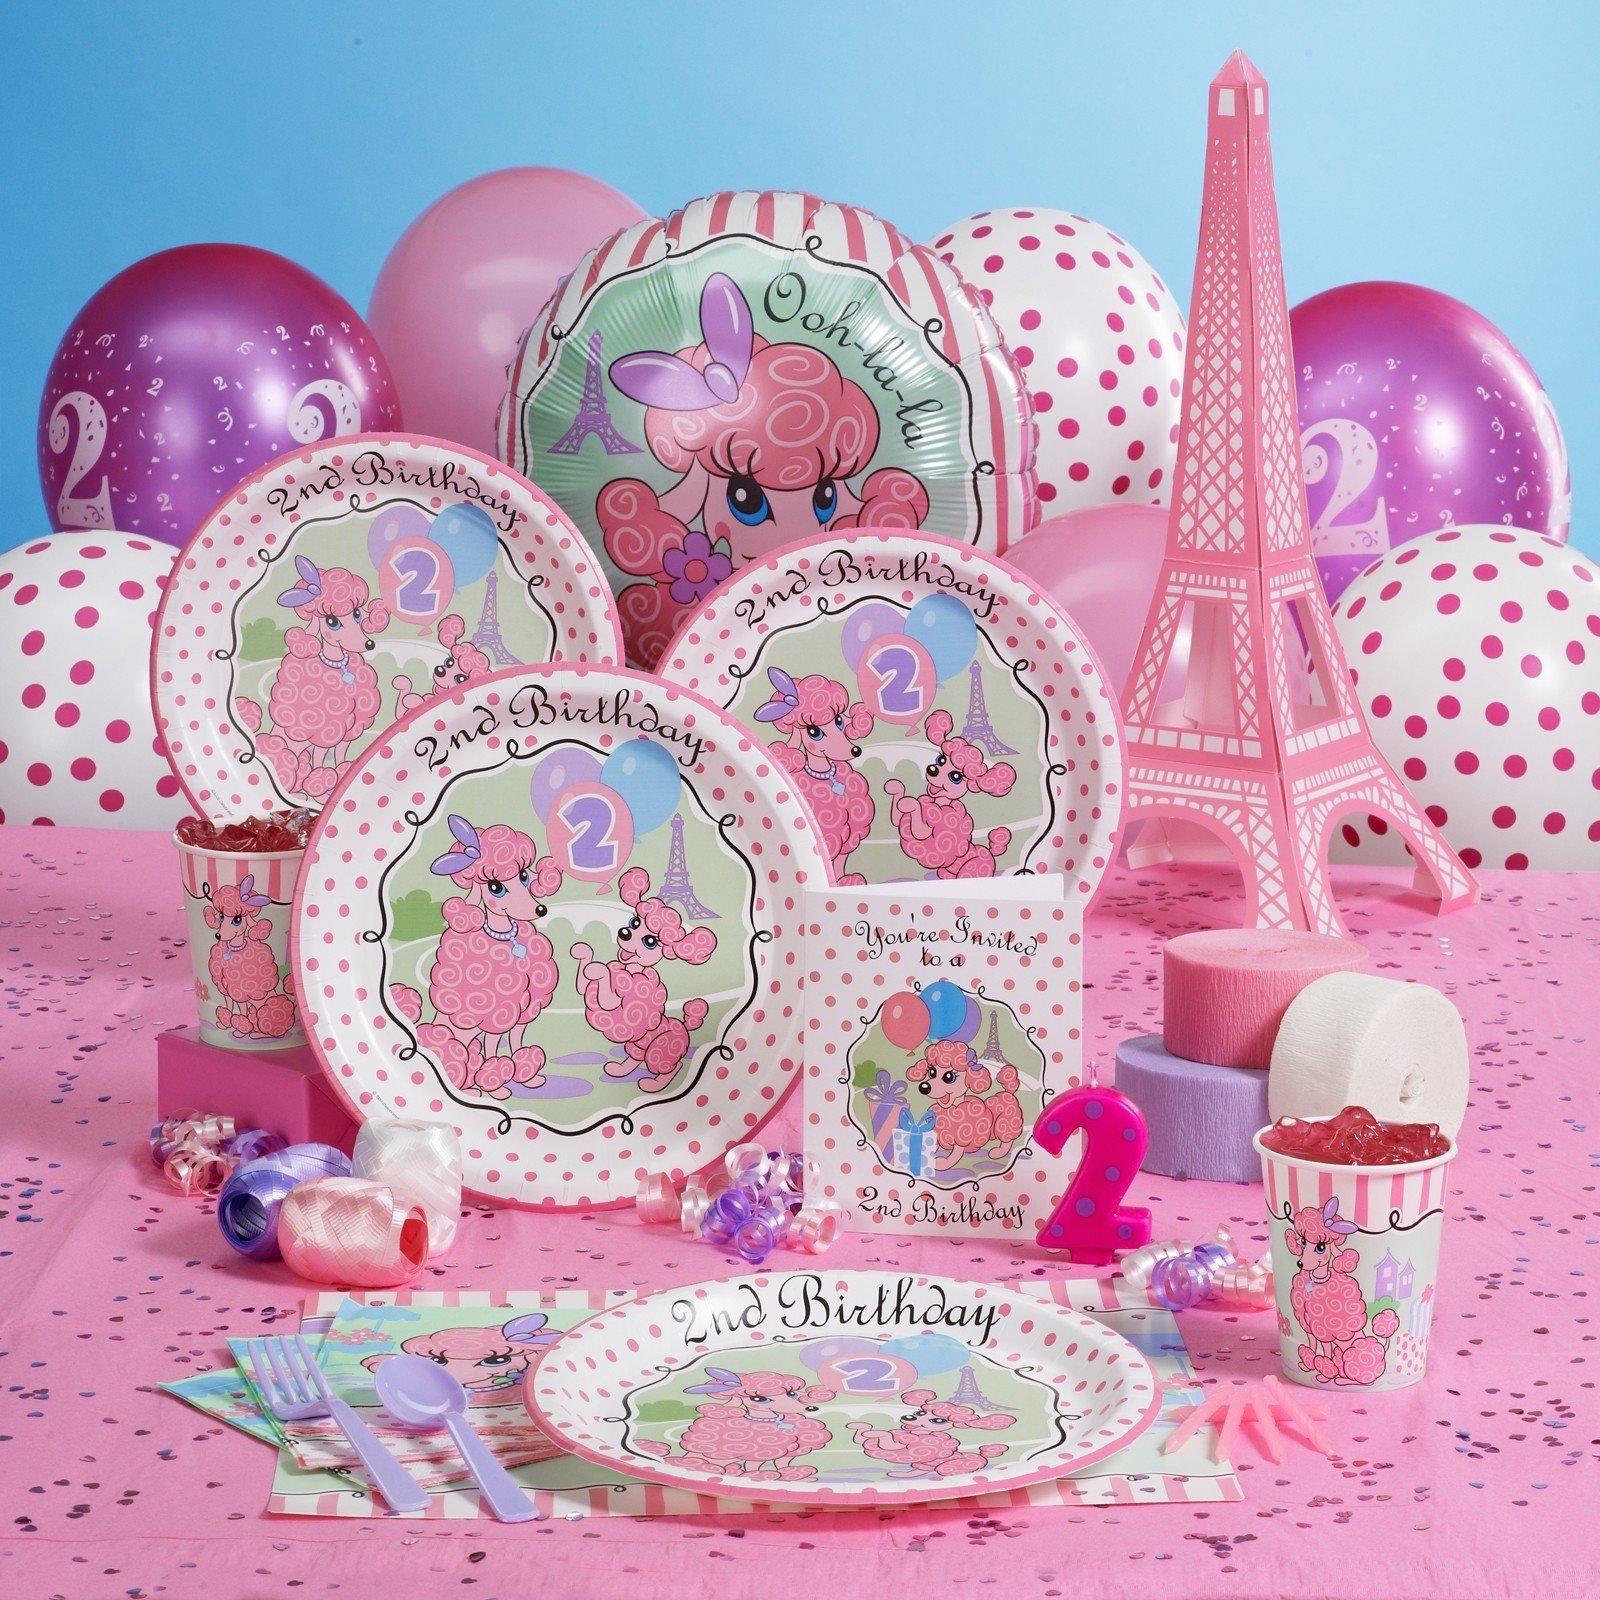 10 Stunning Birthday Ideas For Little Girls littlegirlbirthdaypartyideas unexpectedly expecting baby 8 2021